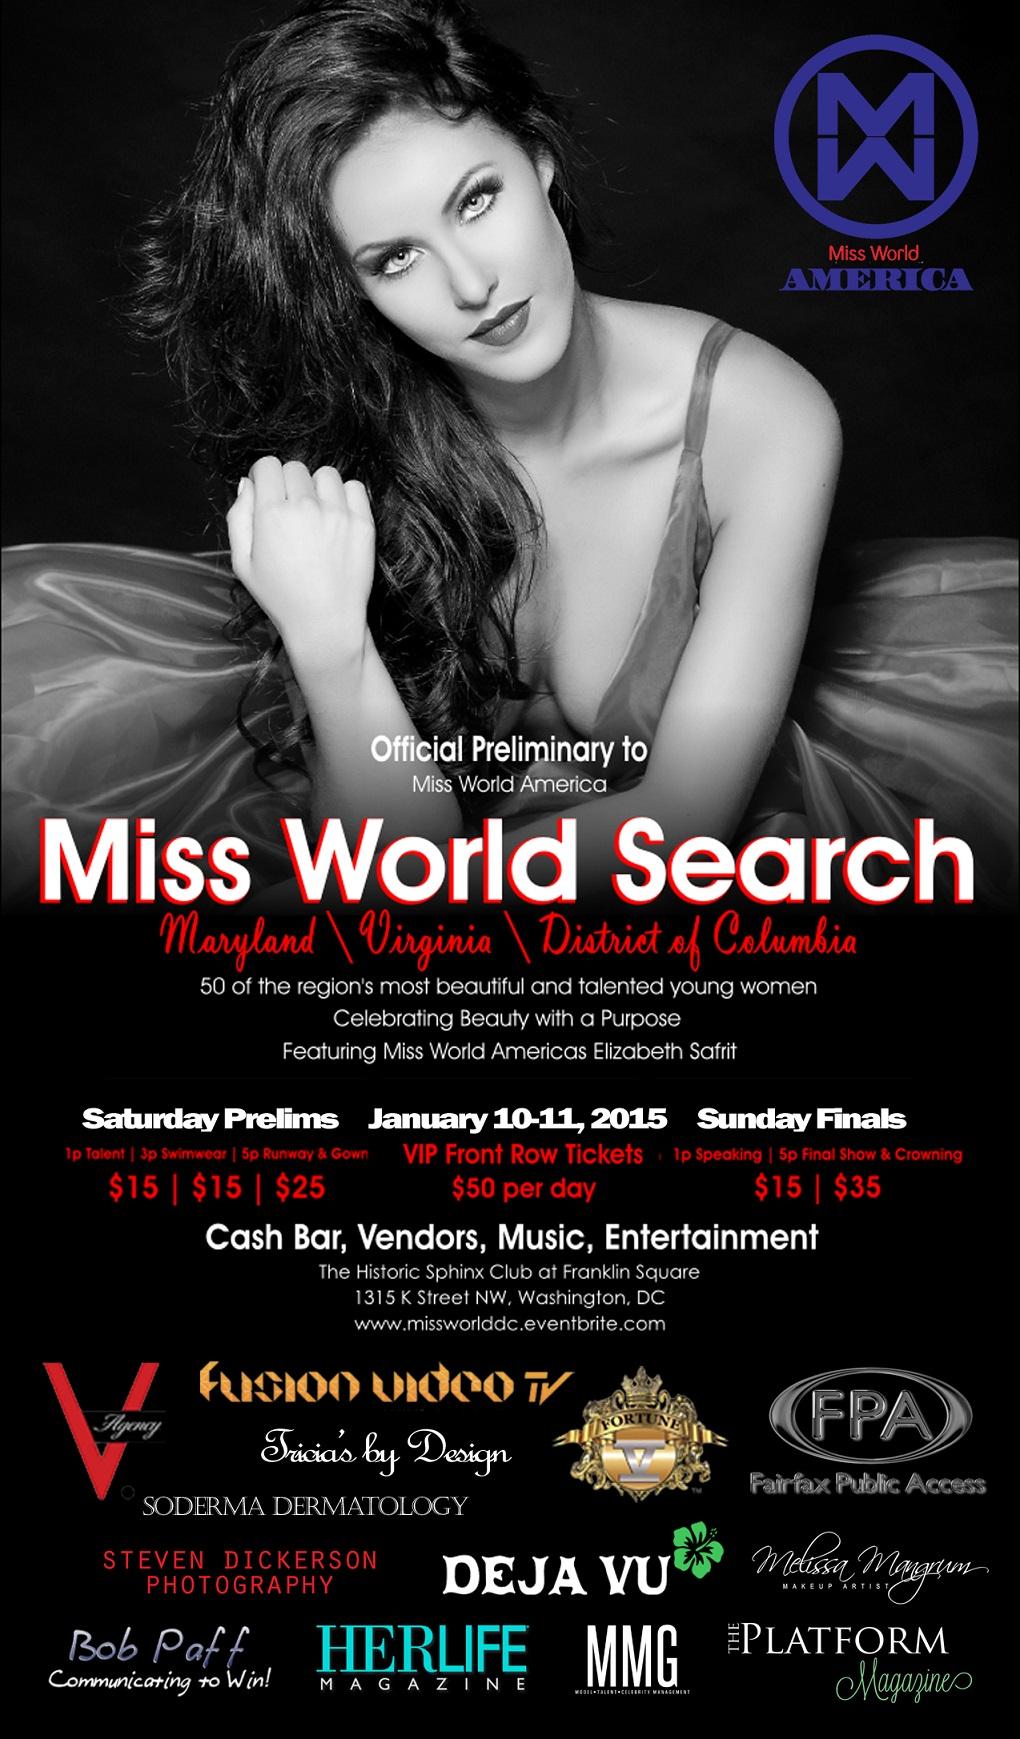 Miss World Search Jan 10-11 2015